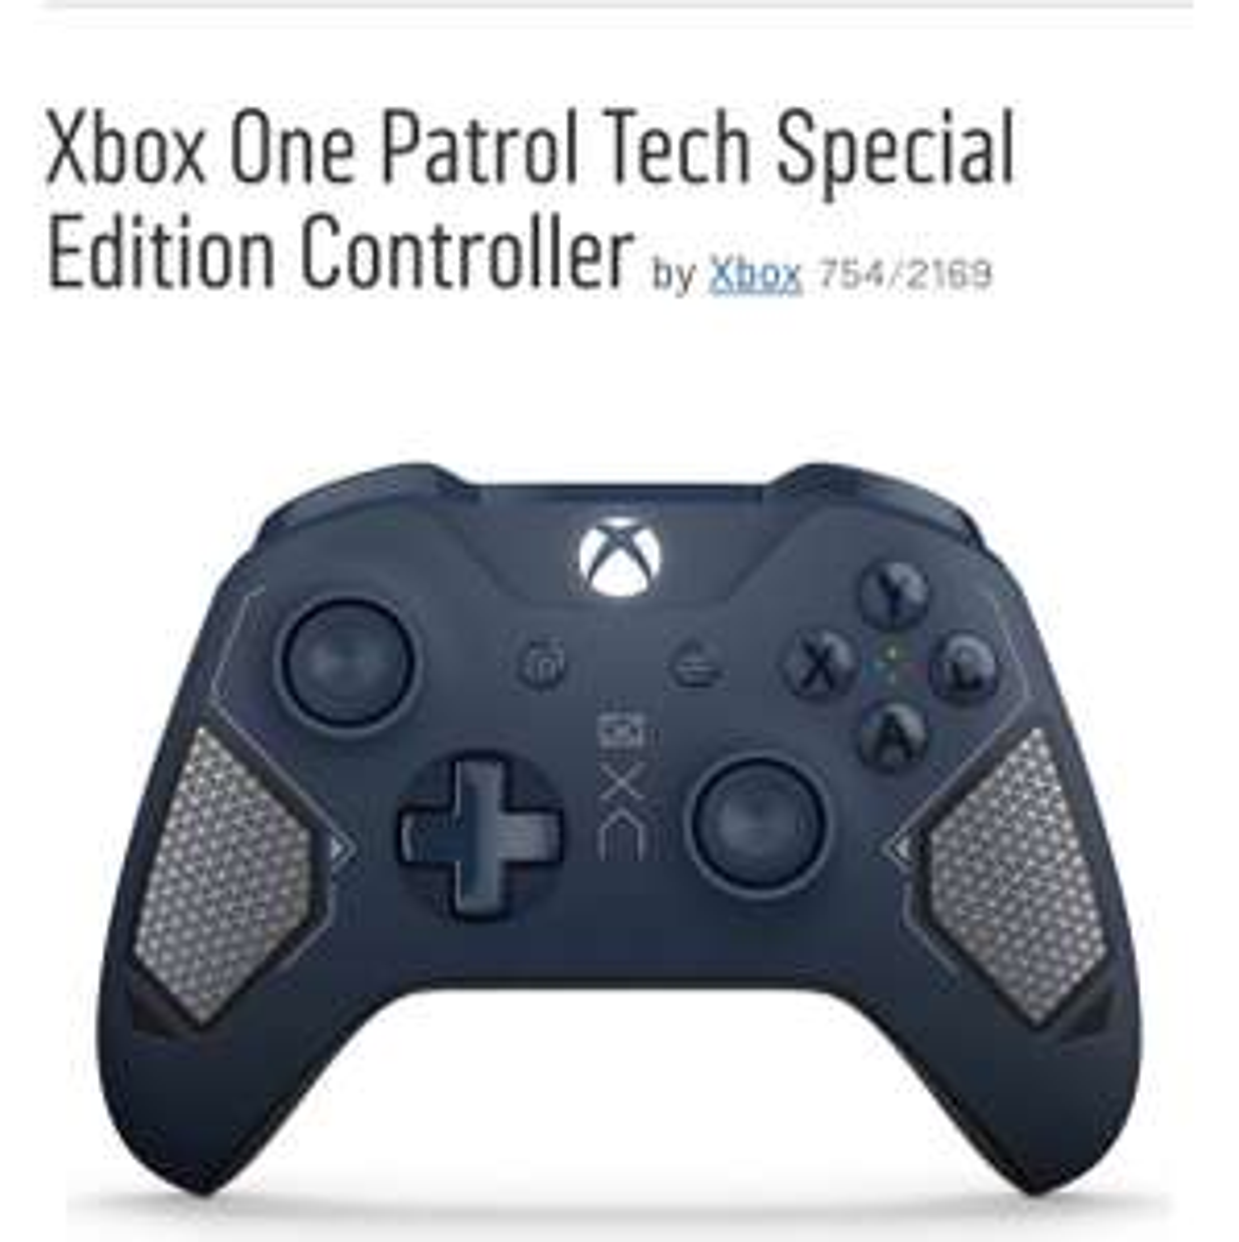 Xbox One Patrol Tech Special Edition Controller pad £42.99 Argos